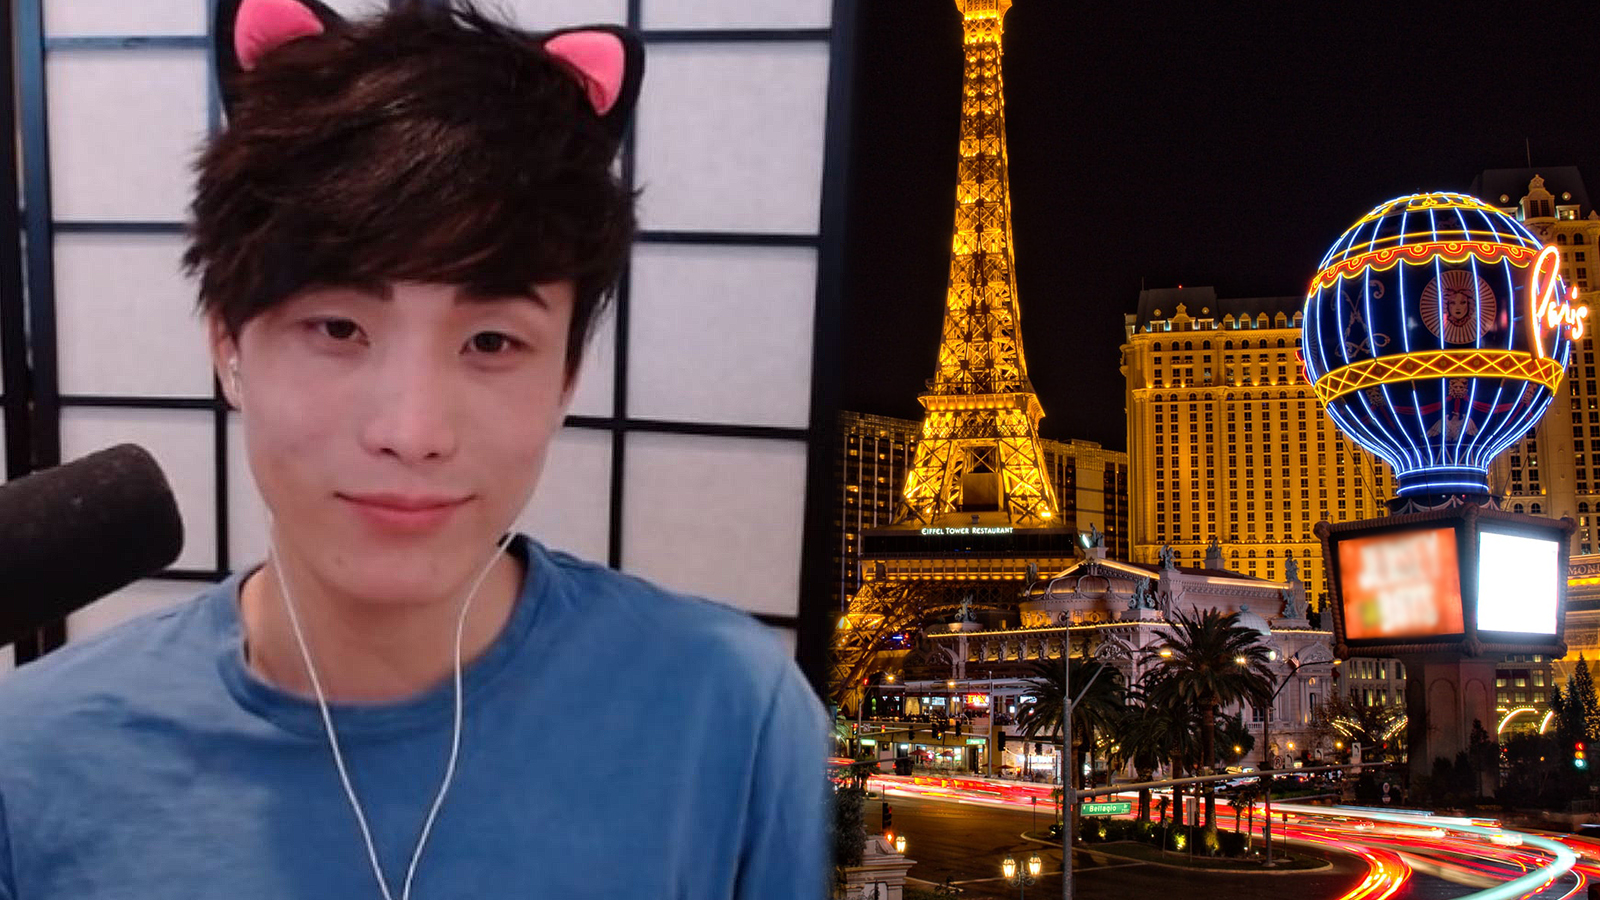 Sykkuno reveals he's moving to Las Vegas